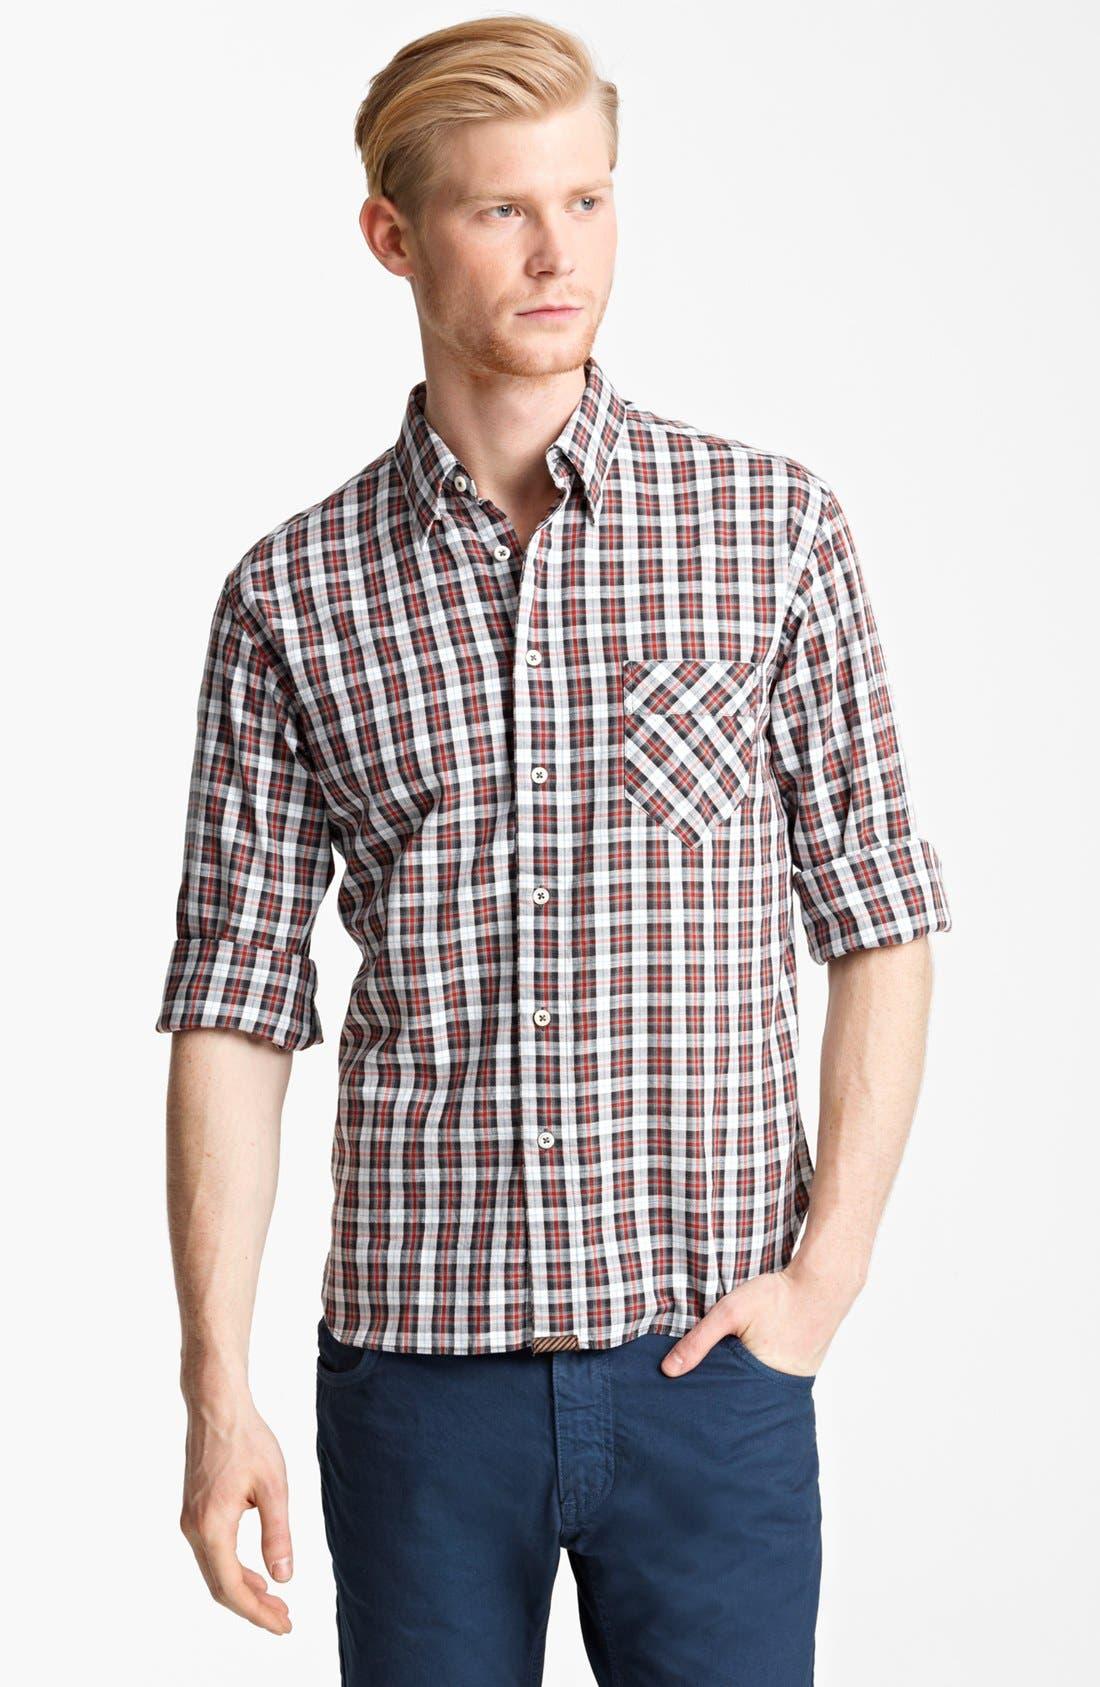 Alternate Image 1 Selected - Billy Reid 'Walland' Plaid Woven Shirt